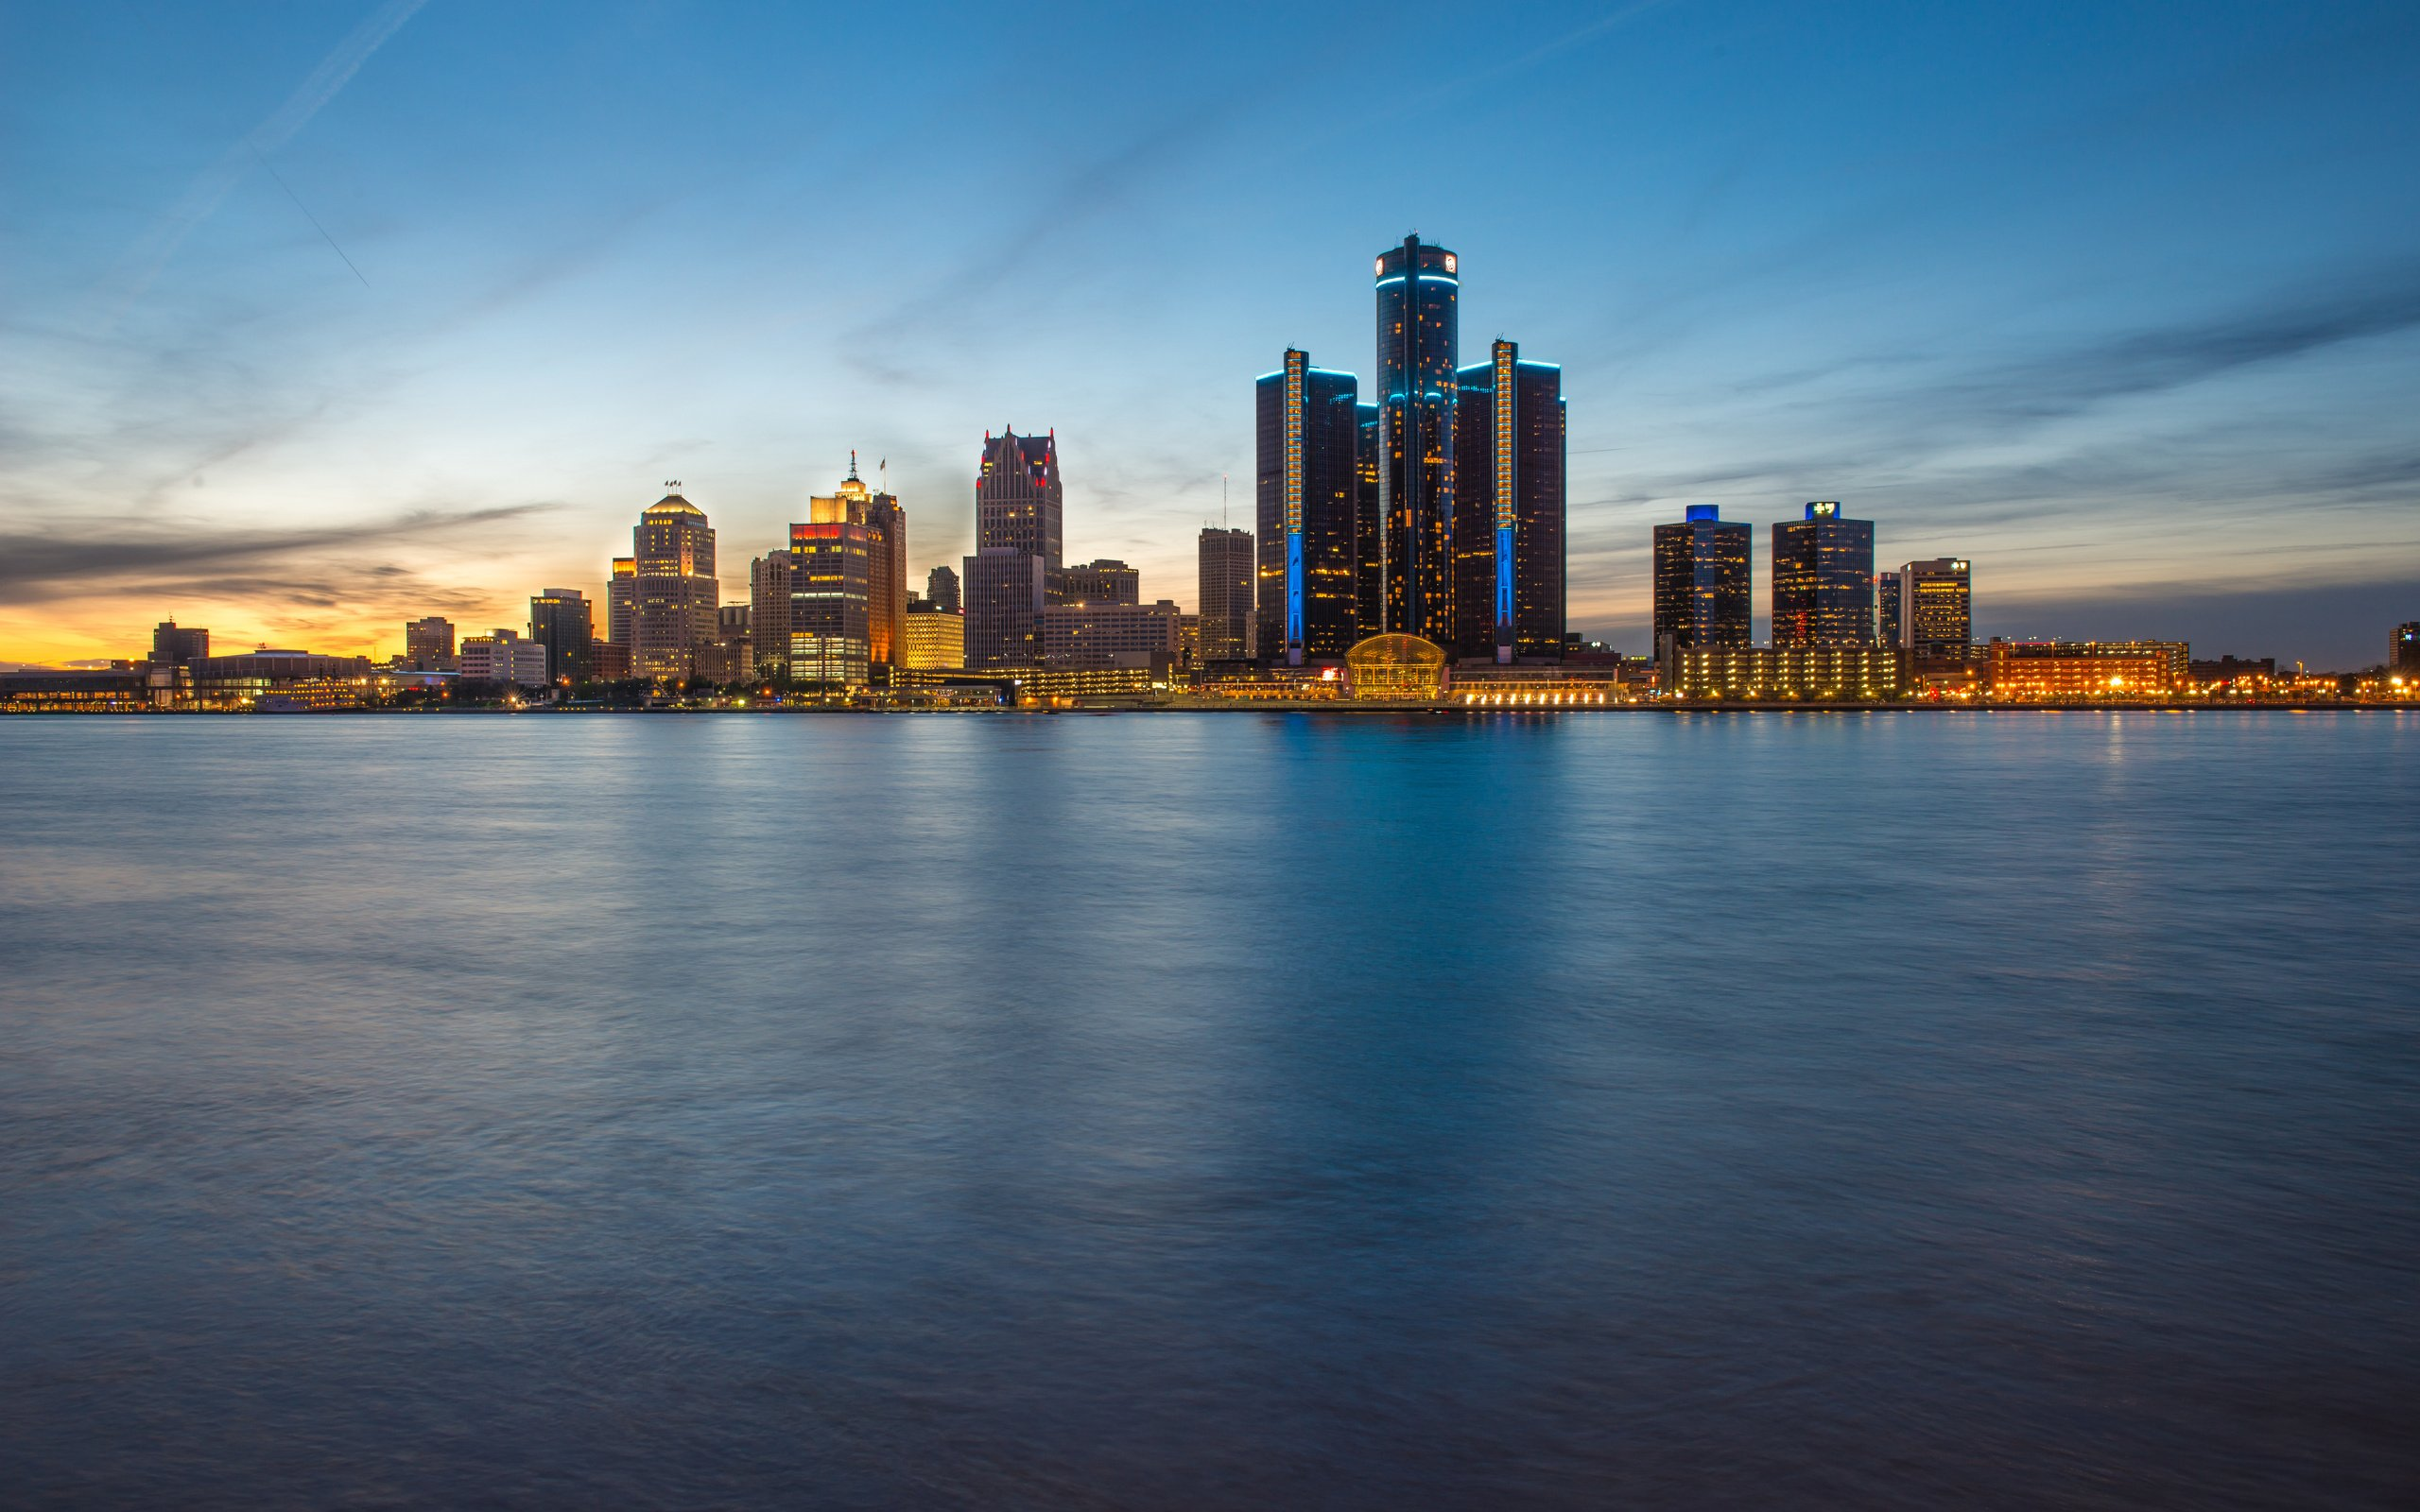 Detroit Screensavers